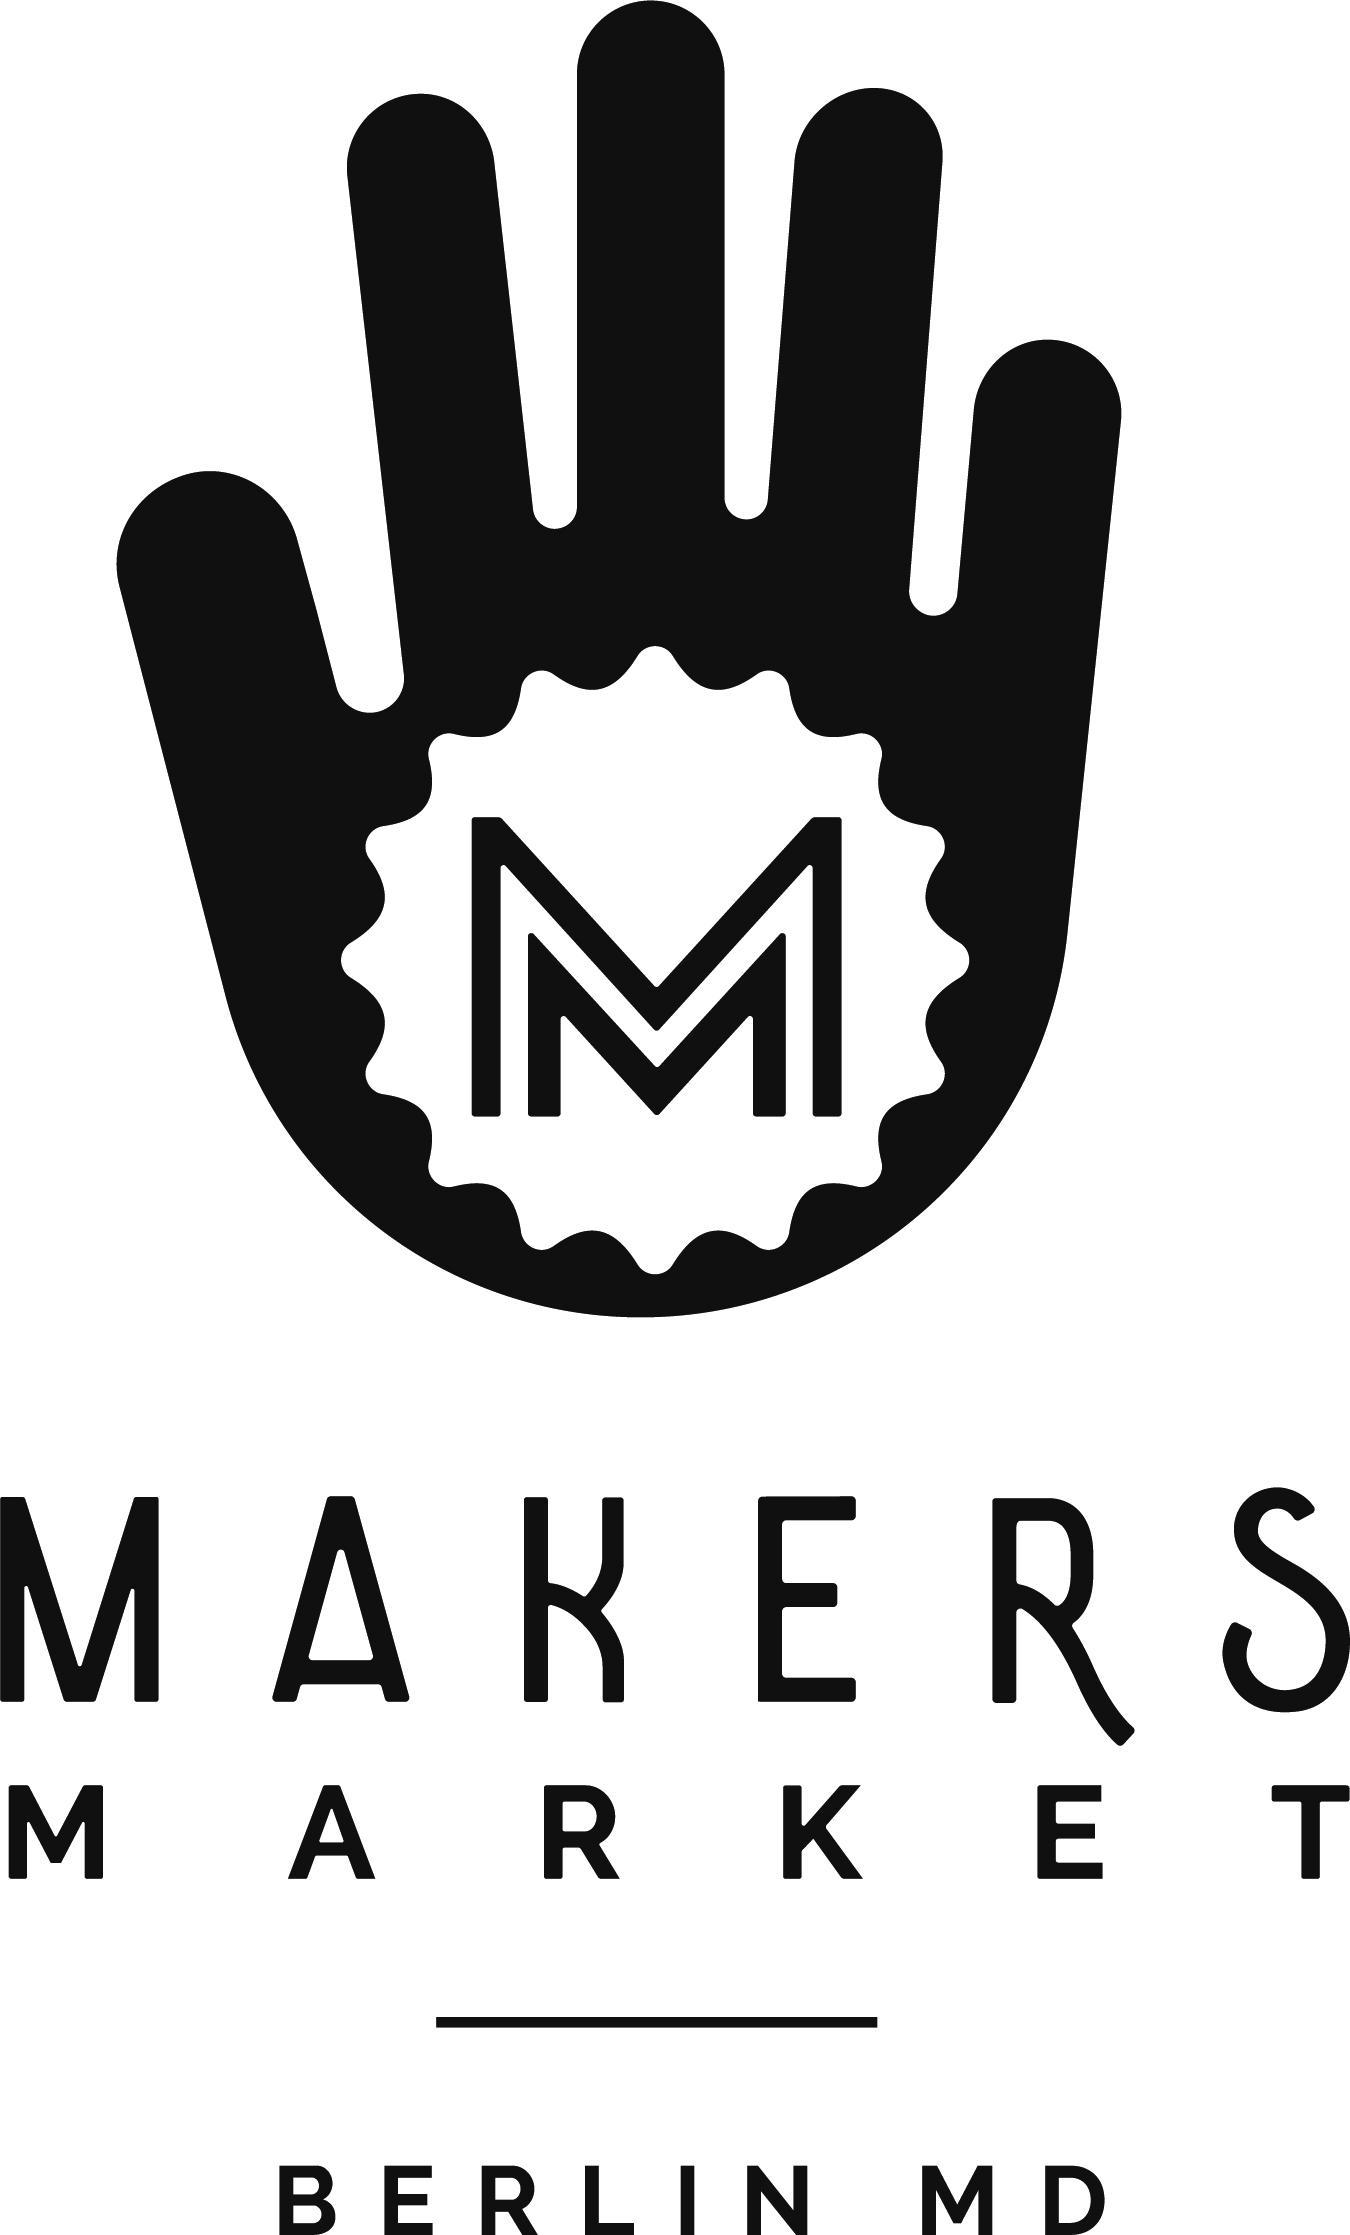 makers-market-logo-hand.jpg